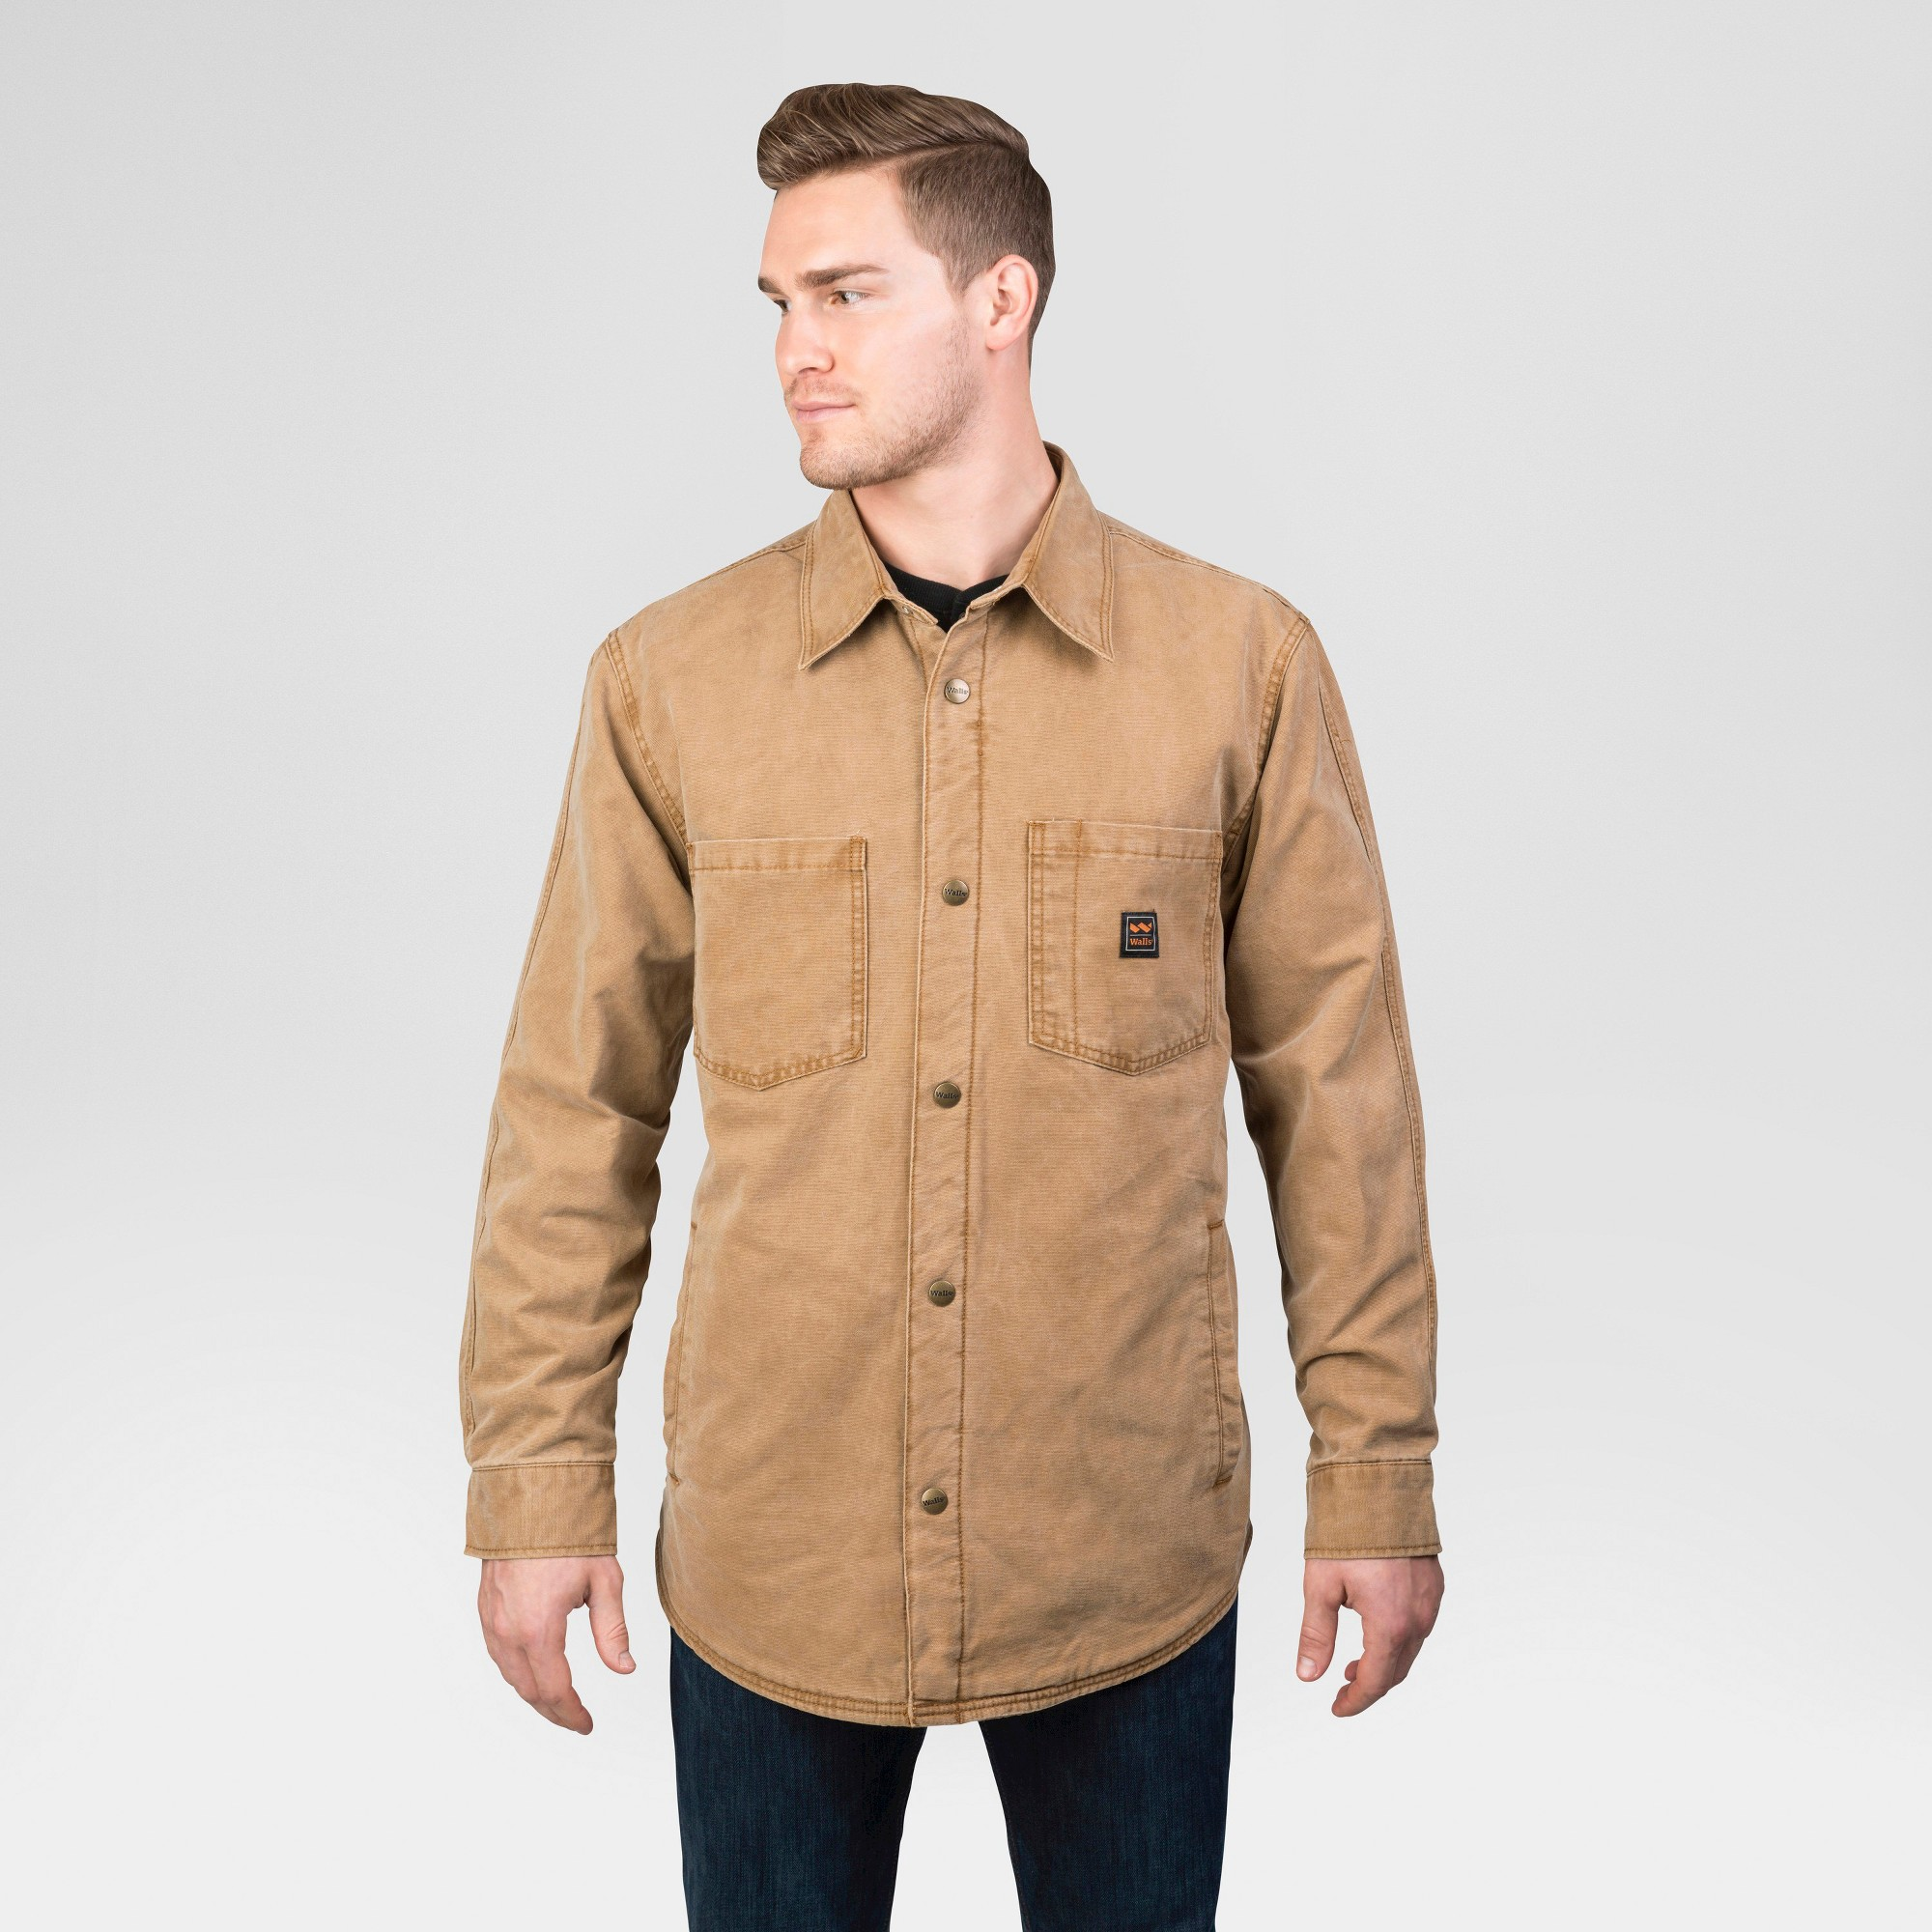 Walls Vintage Duck Shirt Jacket Big Tall Washed Pecan Xxl Men S